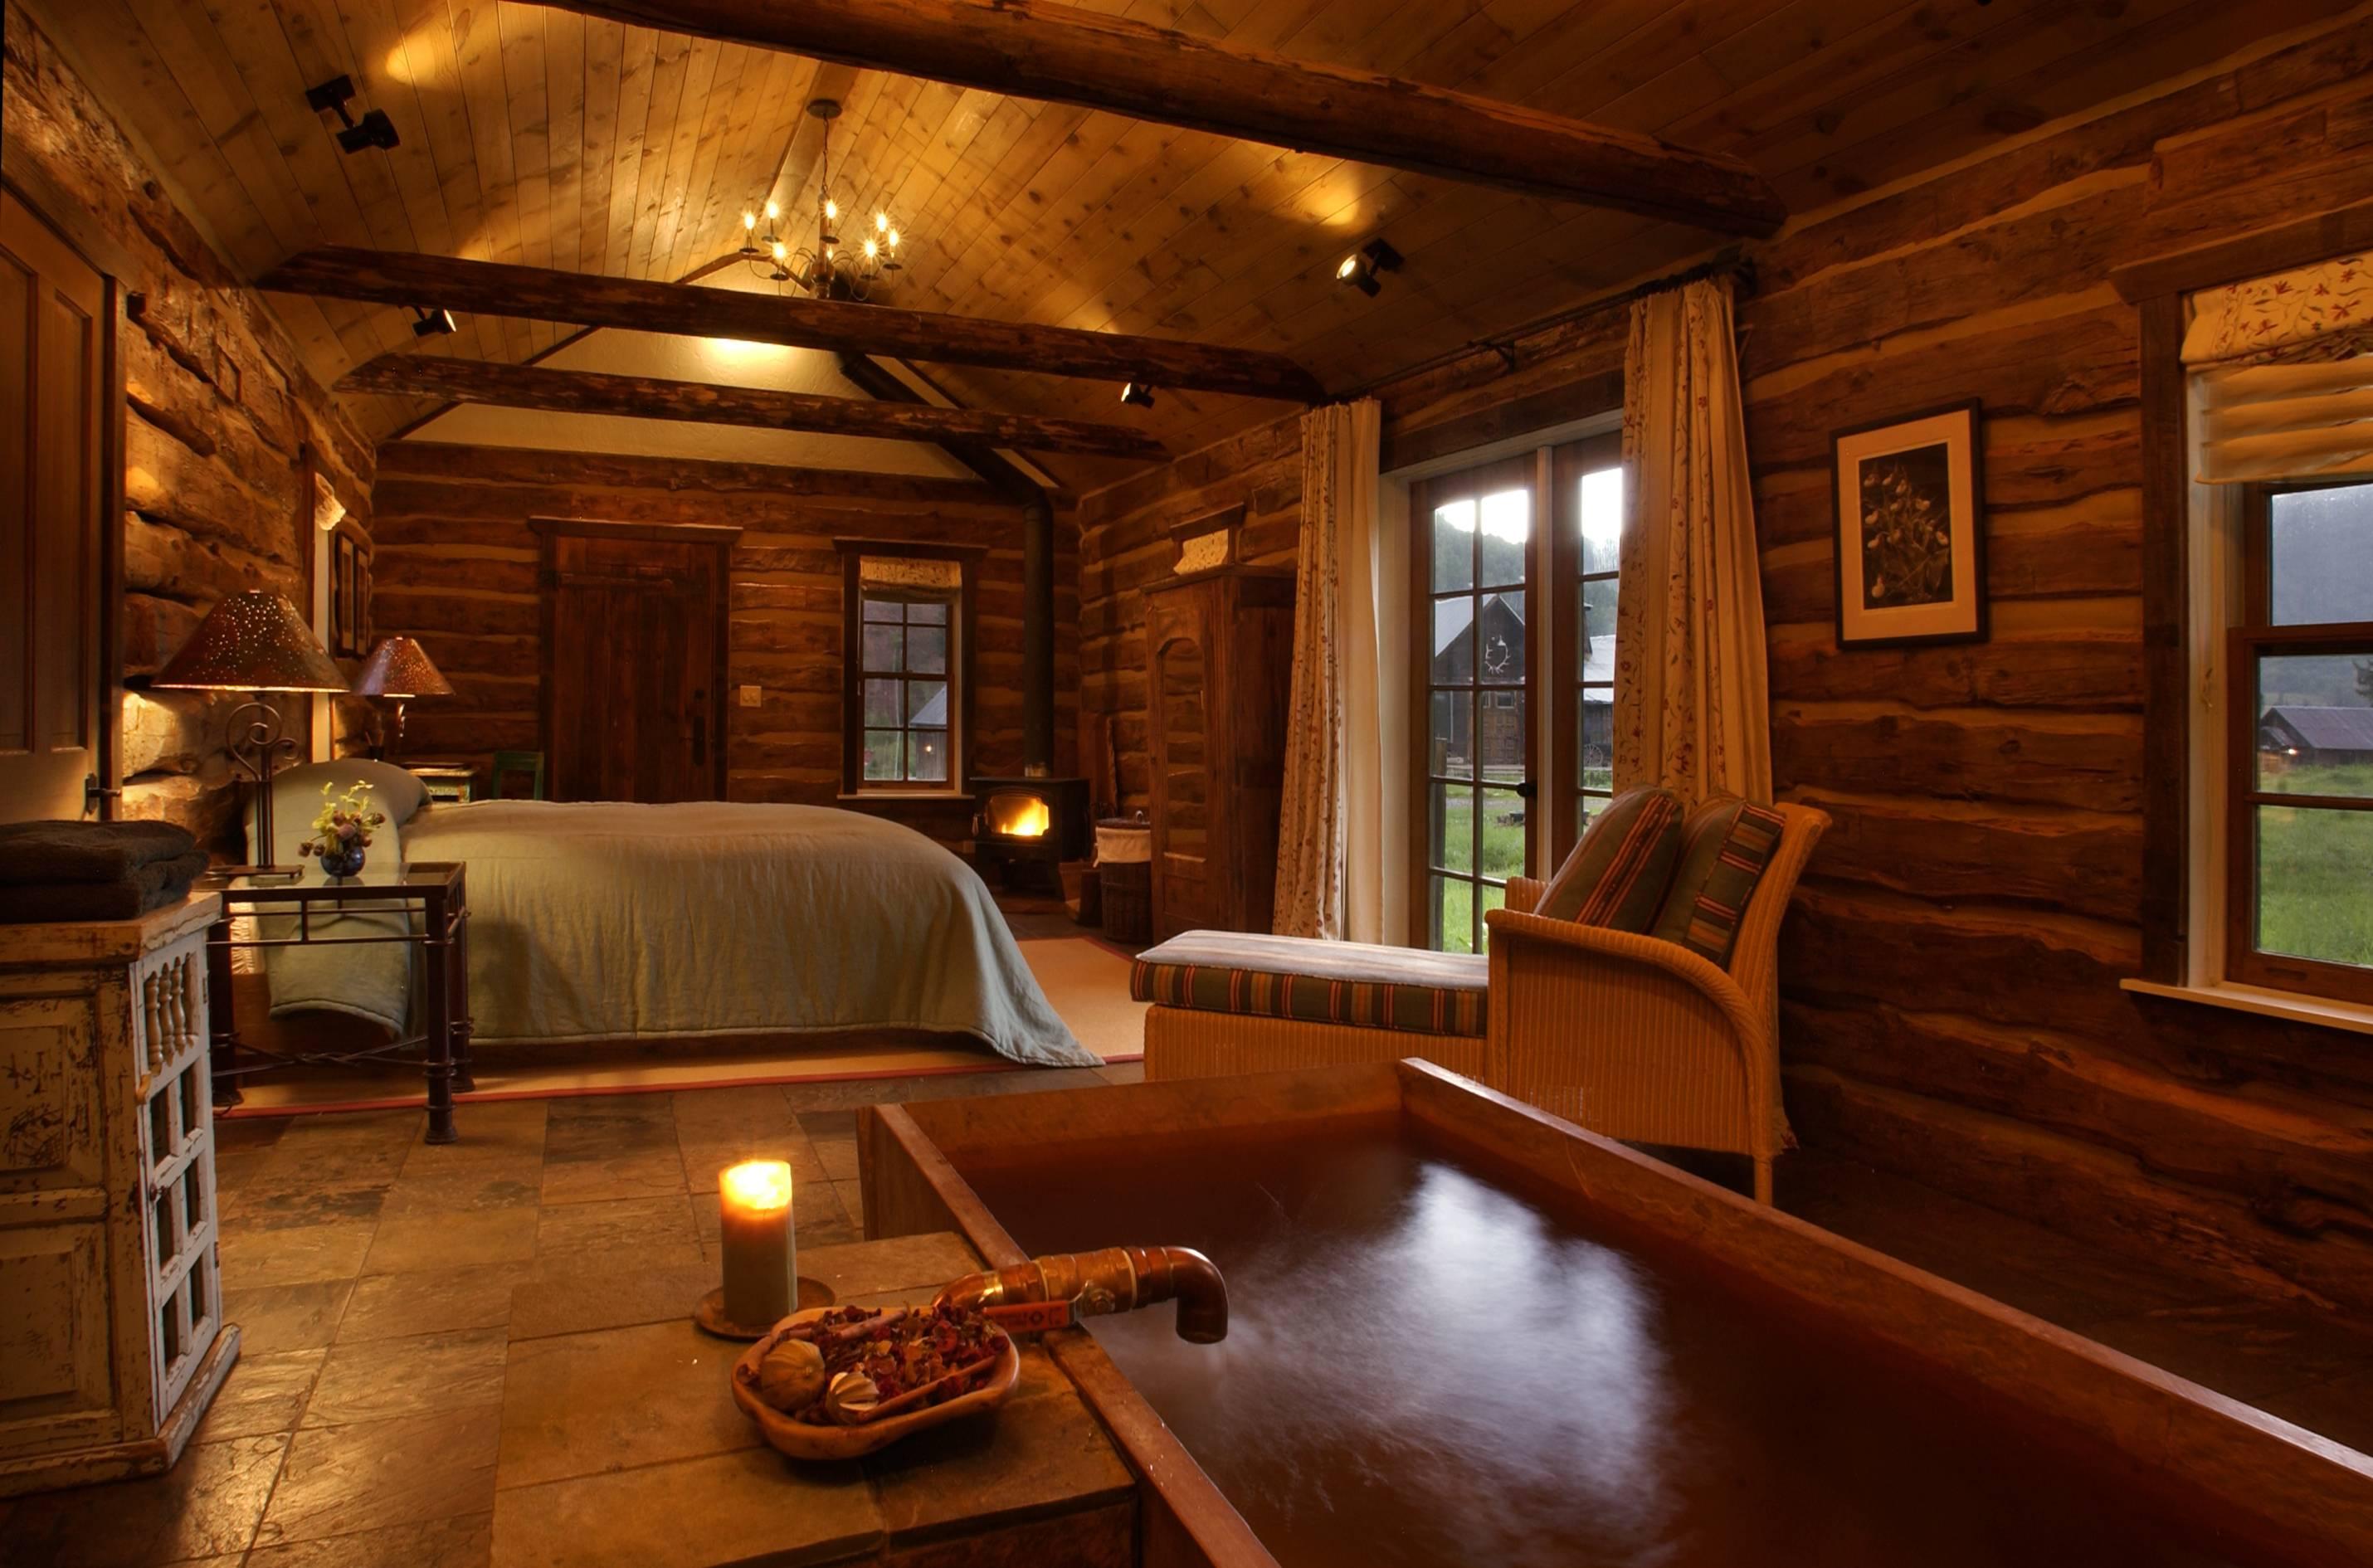 Small Wooden House Interior Design Modern Plan House Plans 150010